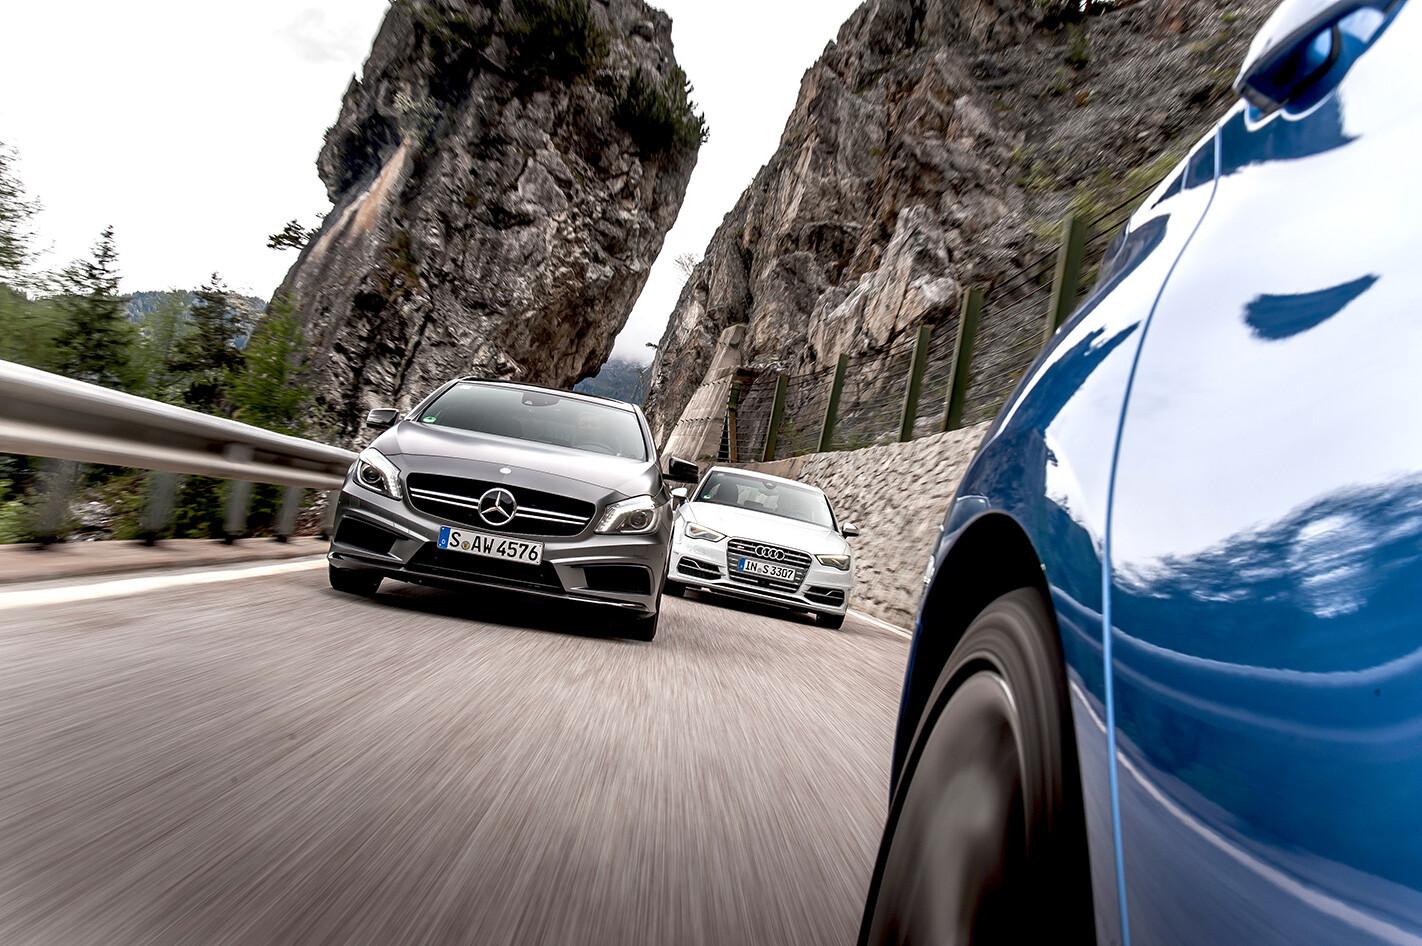 Audi S3 vs BMW M135i vs Mercedes A45 AMG on the road.jpg